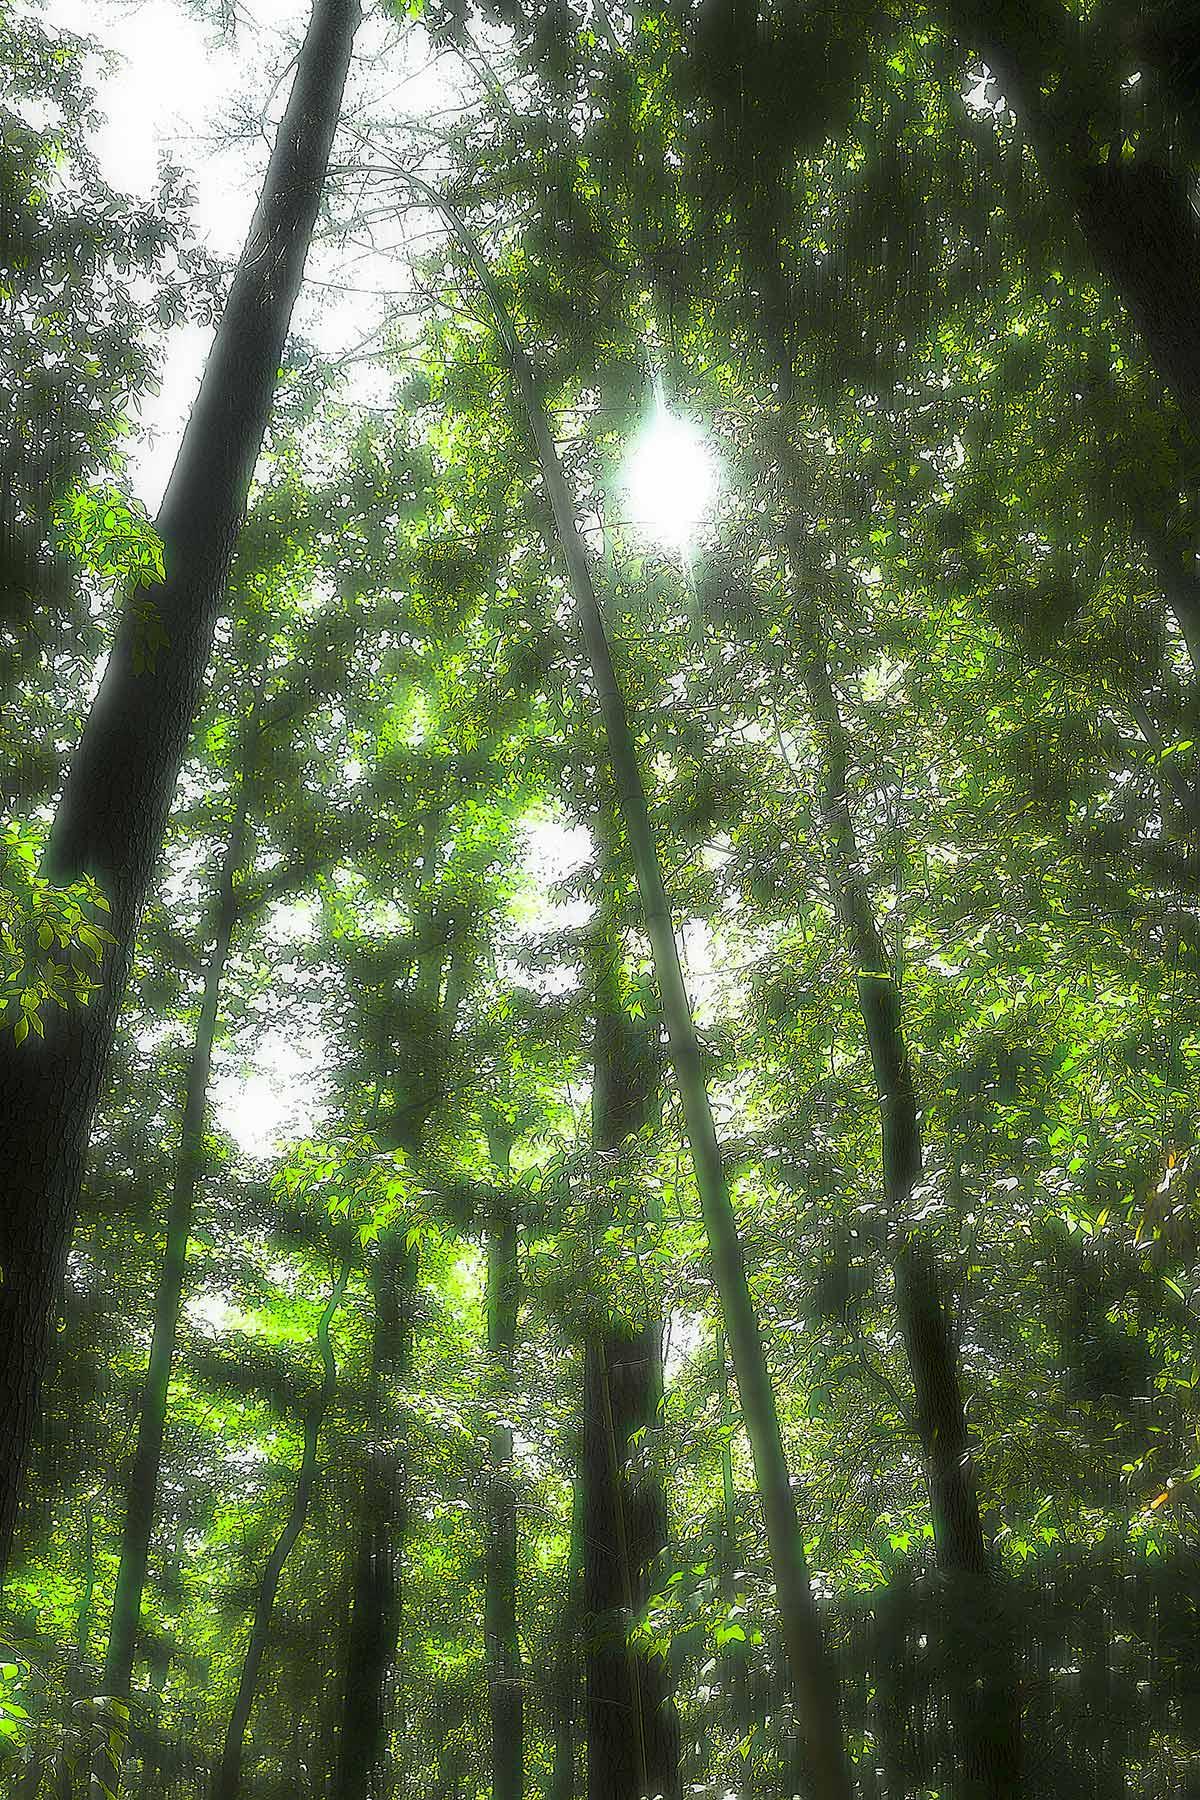 Trees #L0458